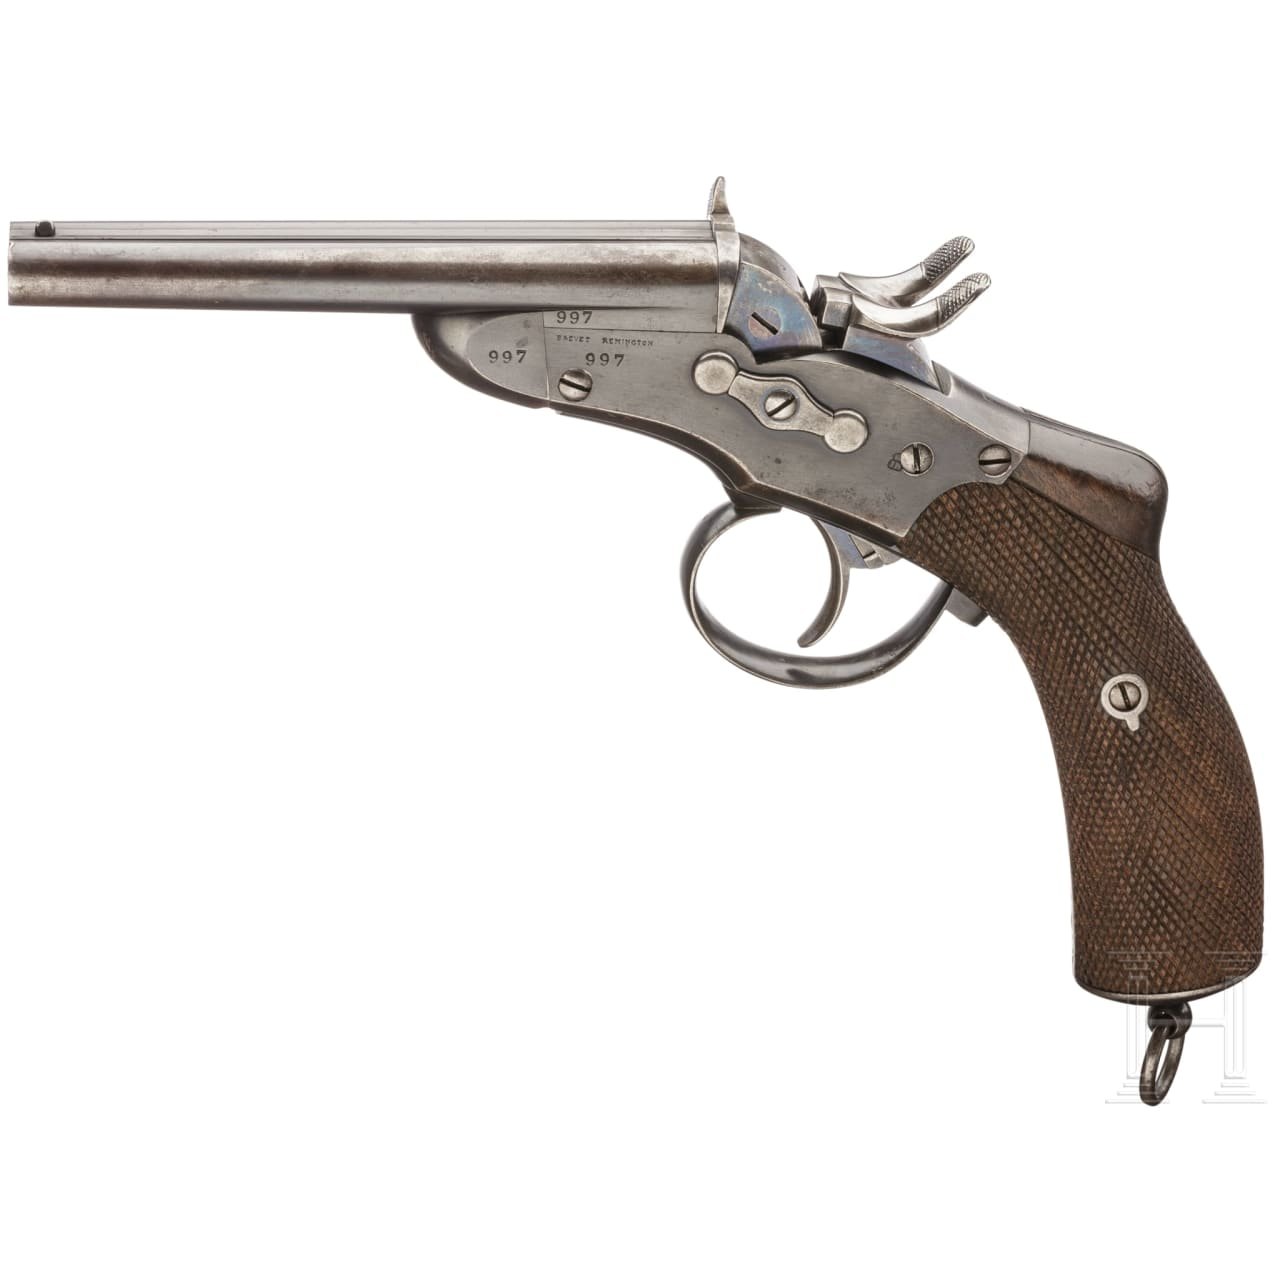 Gendarmeriepistole Mod. 1877